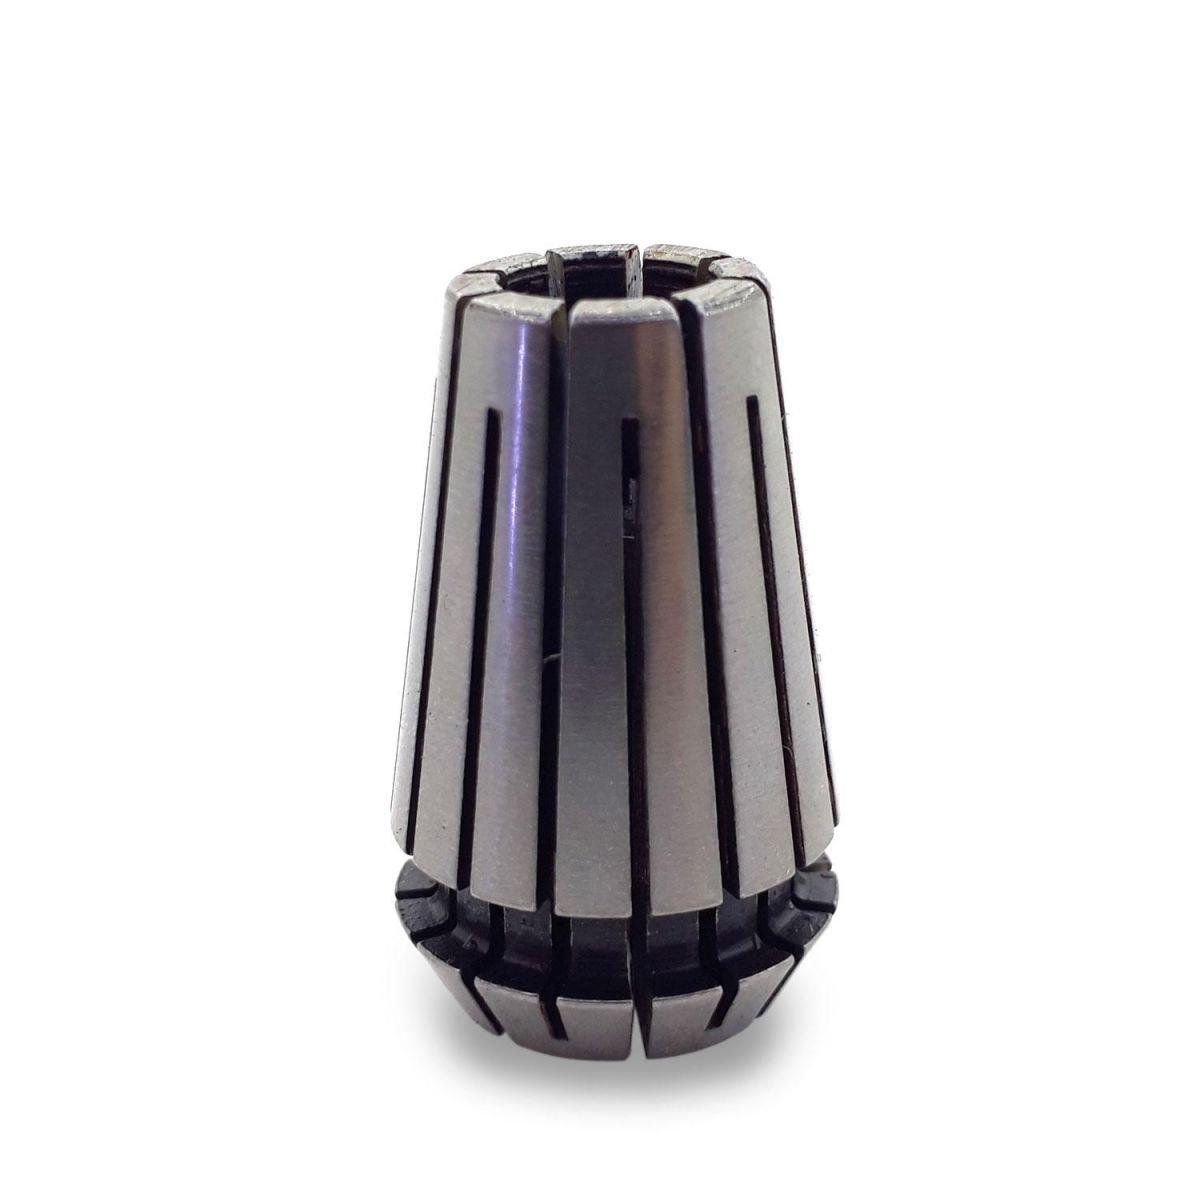 Pinça p/ fresa router cnc ER16 4mm